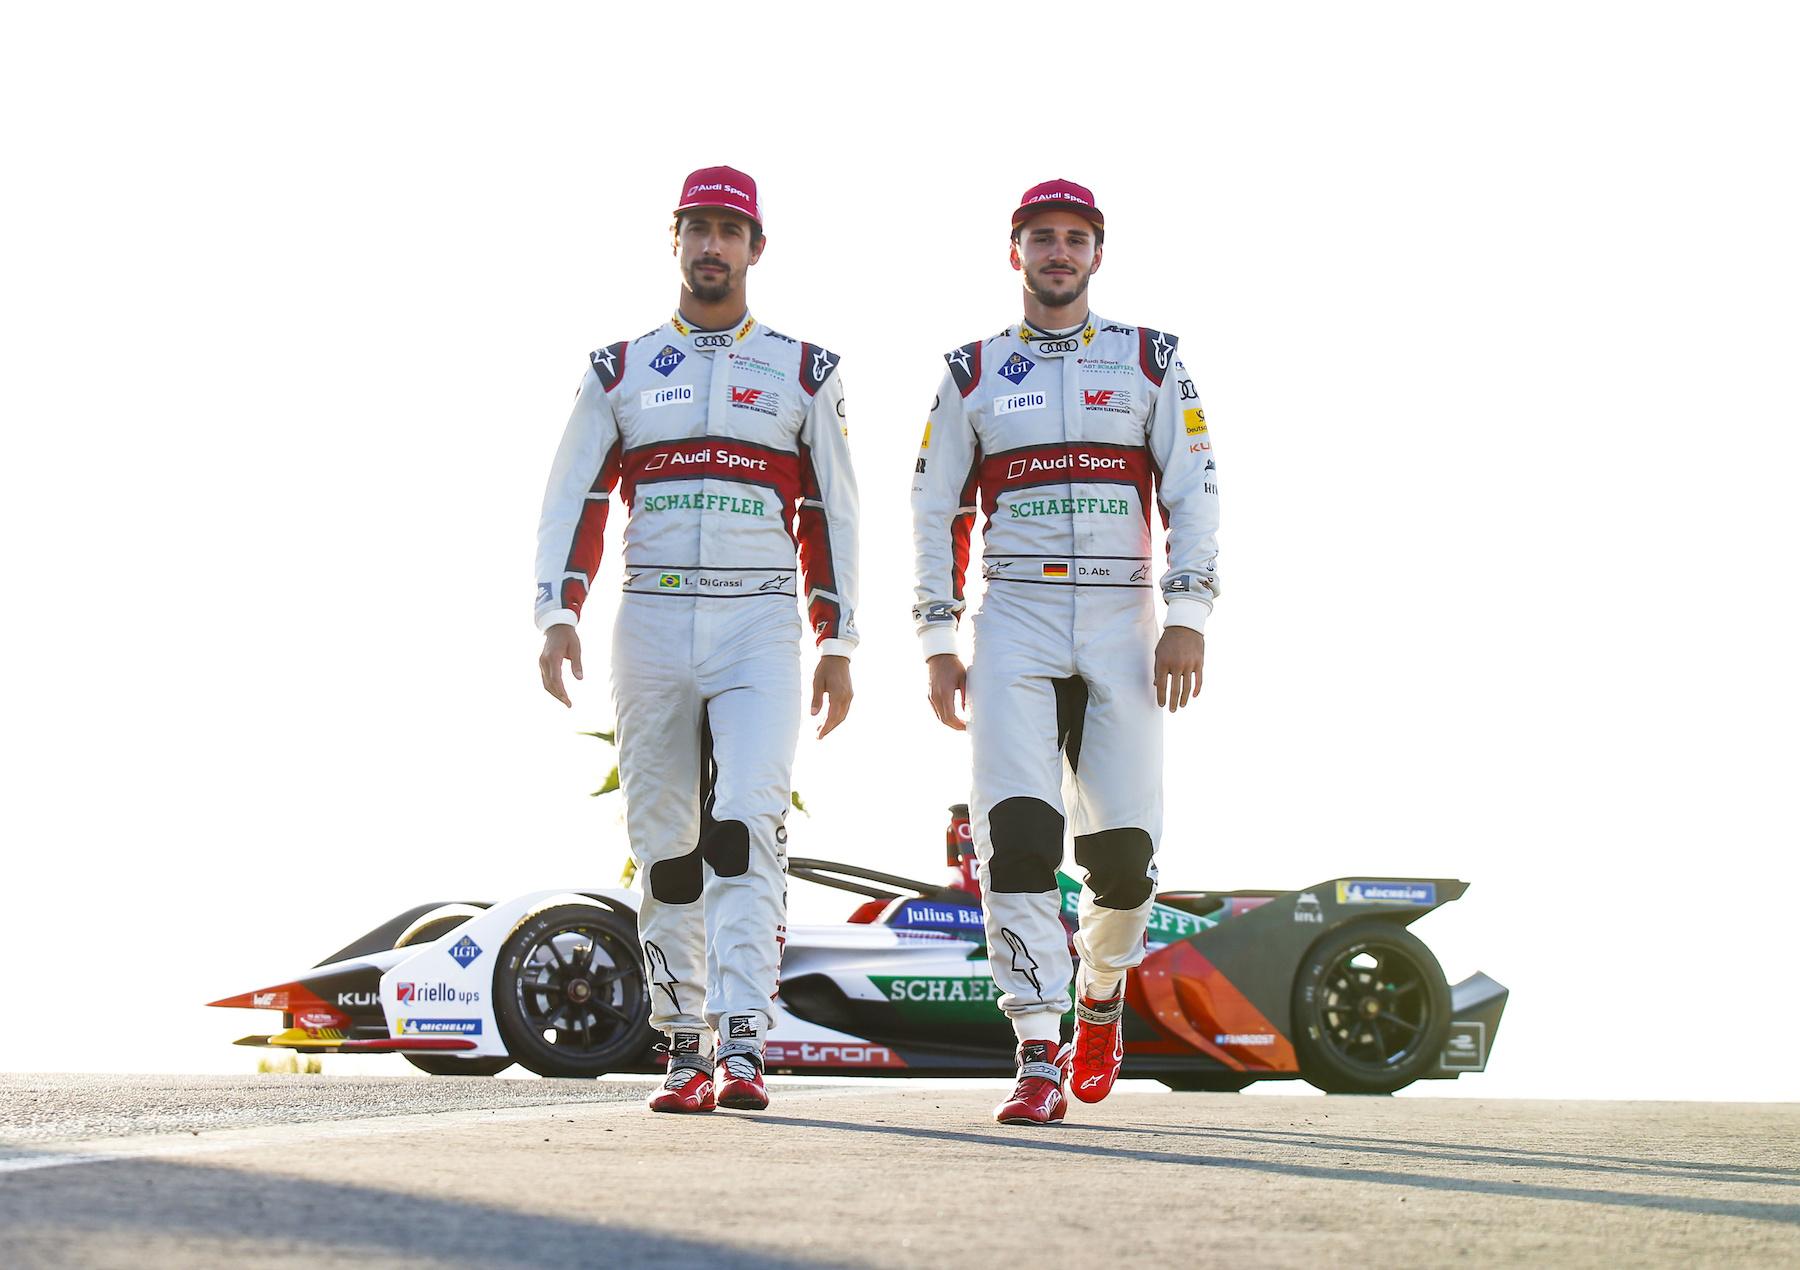 Lucas di Grassi (à gauche) et Daniel Abt devant l'Audi e-tron FE05. (AUDI)